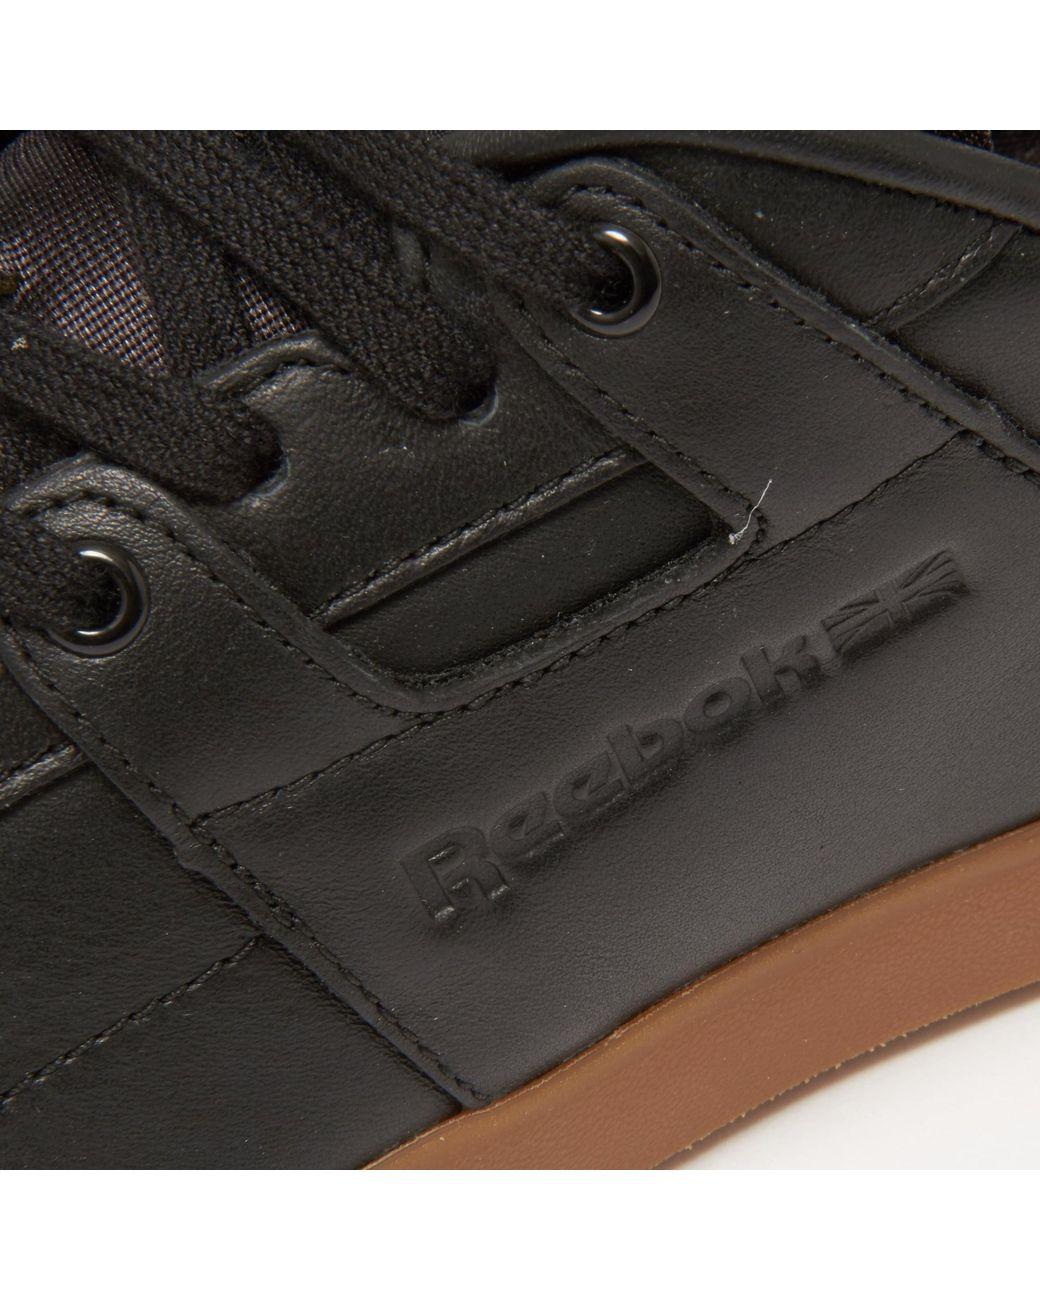 1ef00ac30ef Lyst - Reebok Workout Low Clean Fvs Gum Black Sneakers Bd4766 in Black for  Men